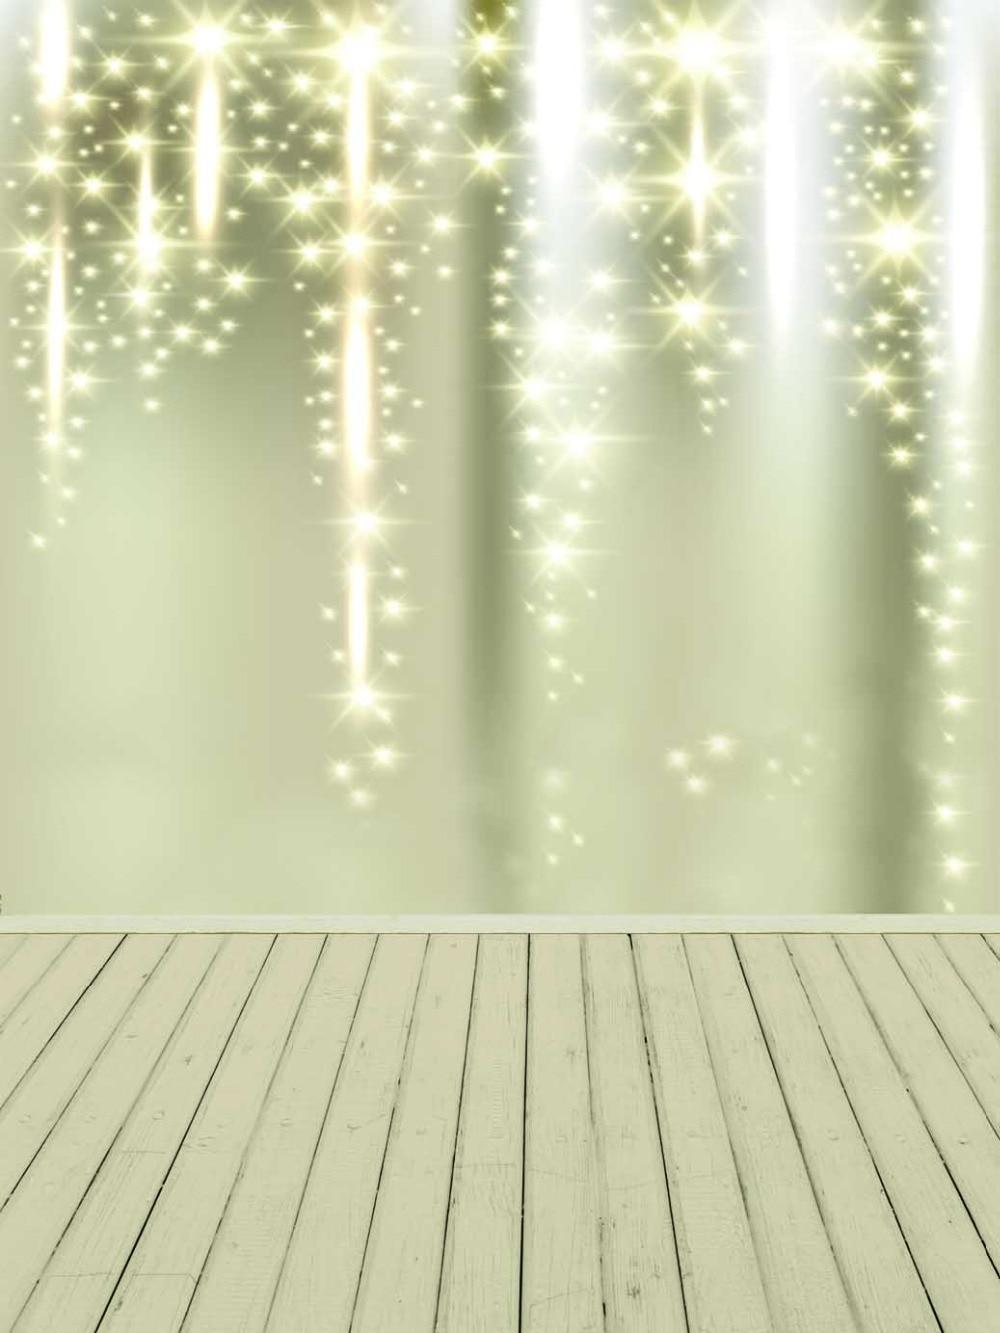 Golden Spark Newborn Photography Backdrop 5x7ft Christmas Backgrounds Studio Wood Floor Photograpic Background for Kids Shoot christmas photography backdrop green tree dark wood floor xmas backdrop for newborn kids photo booth backgrounds studio custom